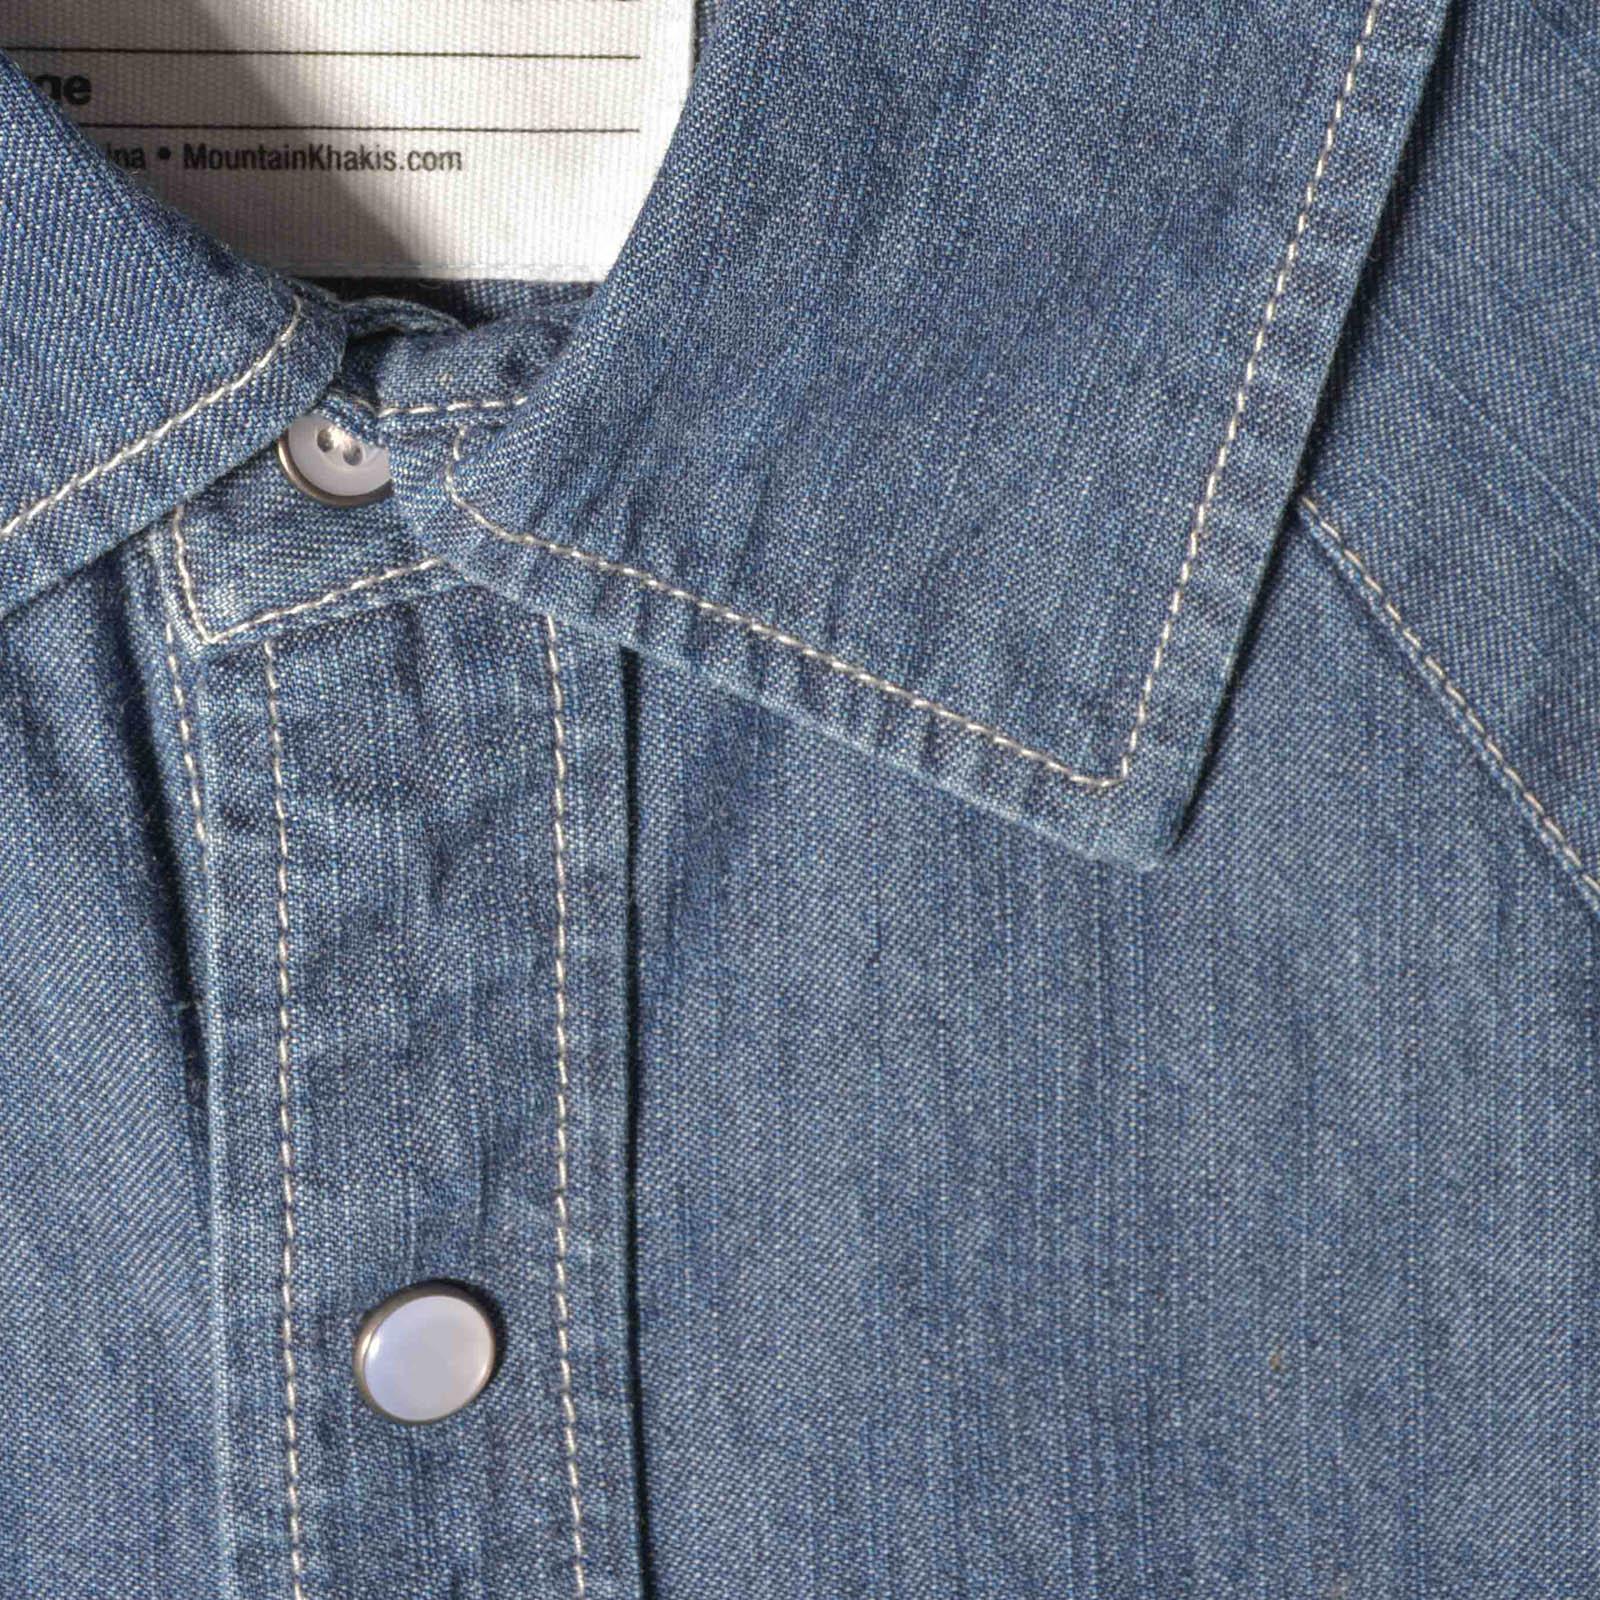 4fe4a4ac2f1 M original mountain denim shirt darkindigo raisinplaid collardetails